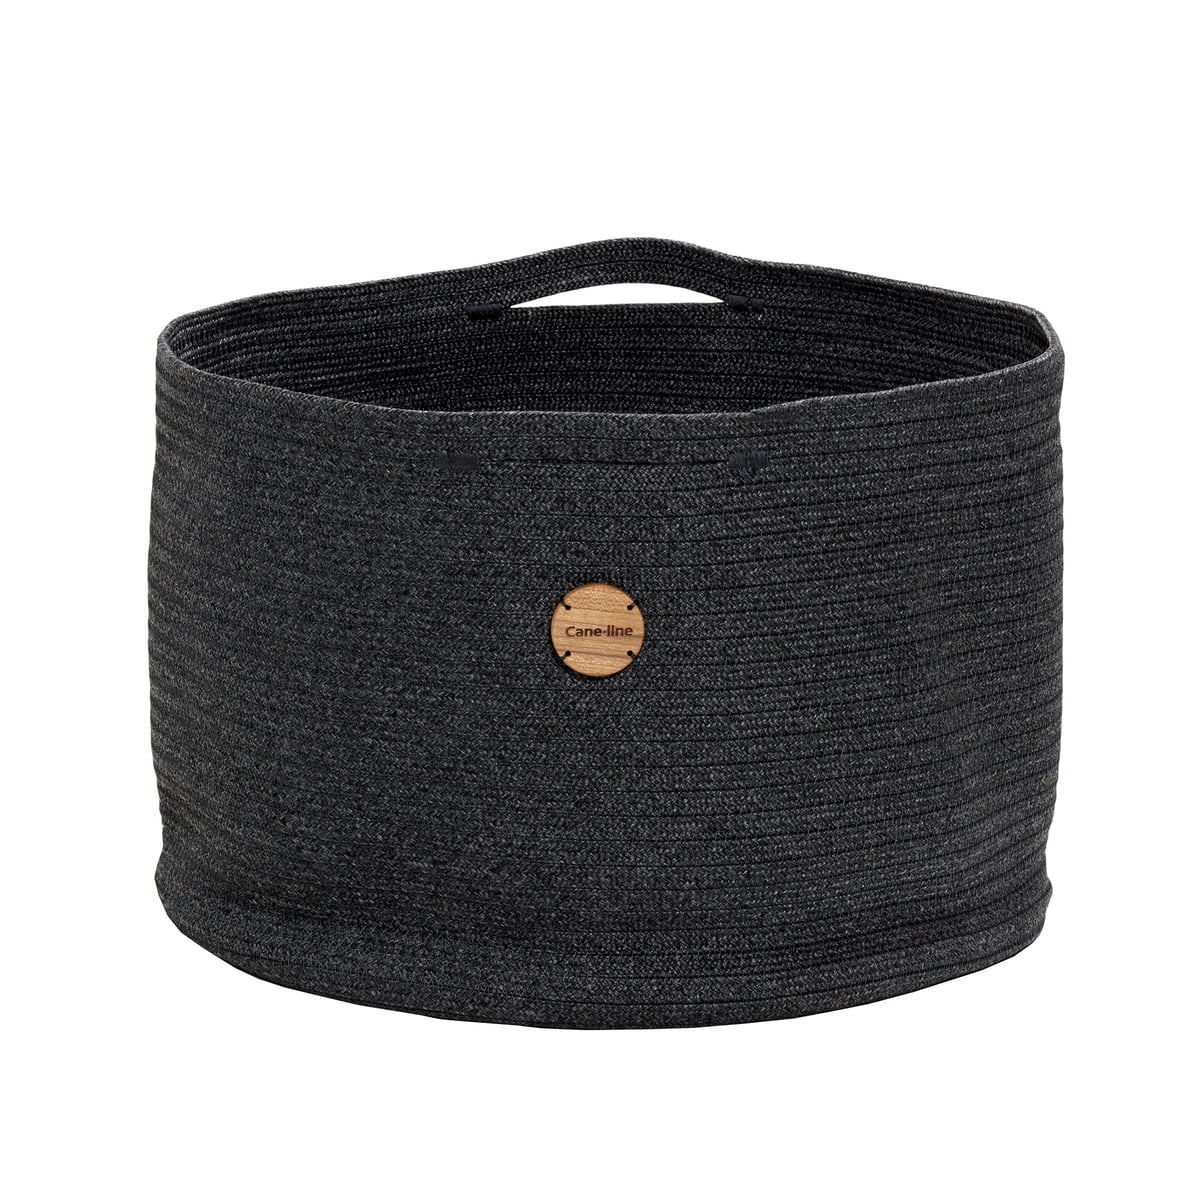 Cane-line - Soft Aufbewahrungskorb Ø 50 cm, dunkelgrau